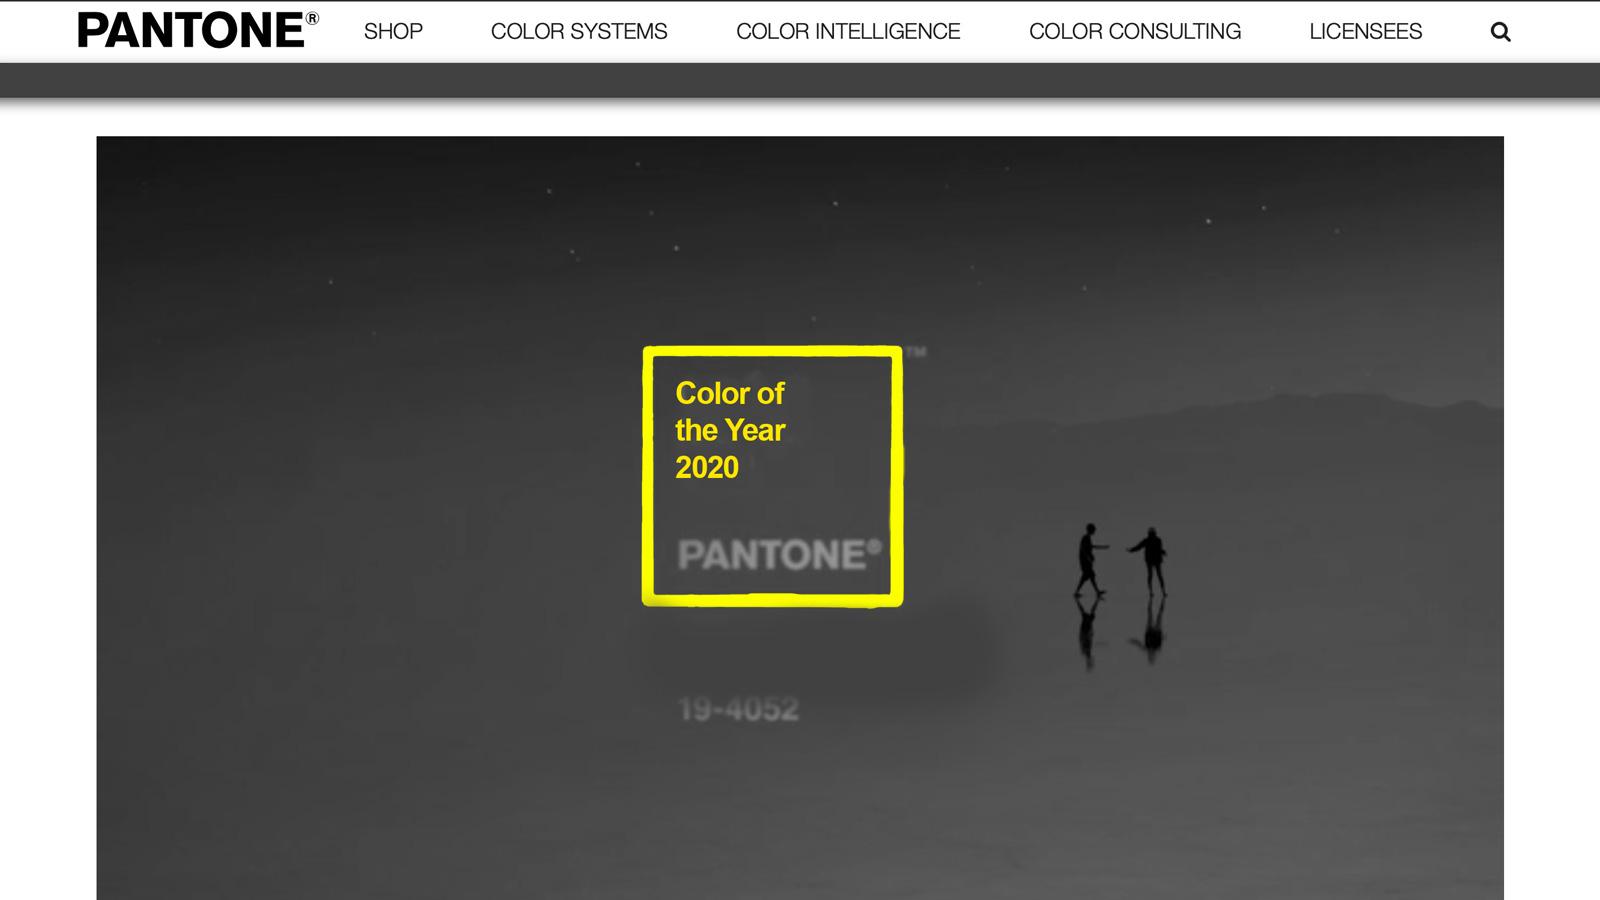 PANTONE ogłosił kolor roku 2020 kolory mediarun kolor roku 2020 PANTONE www 1